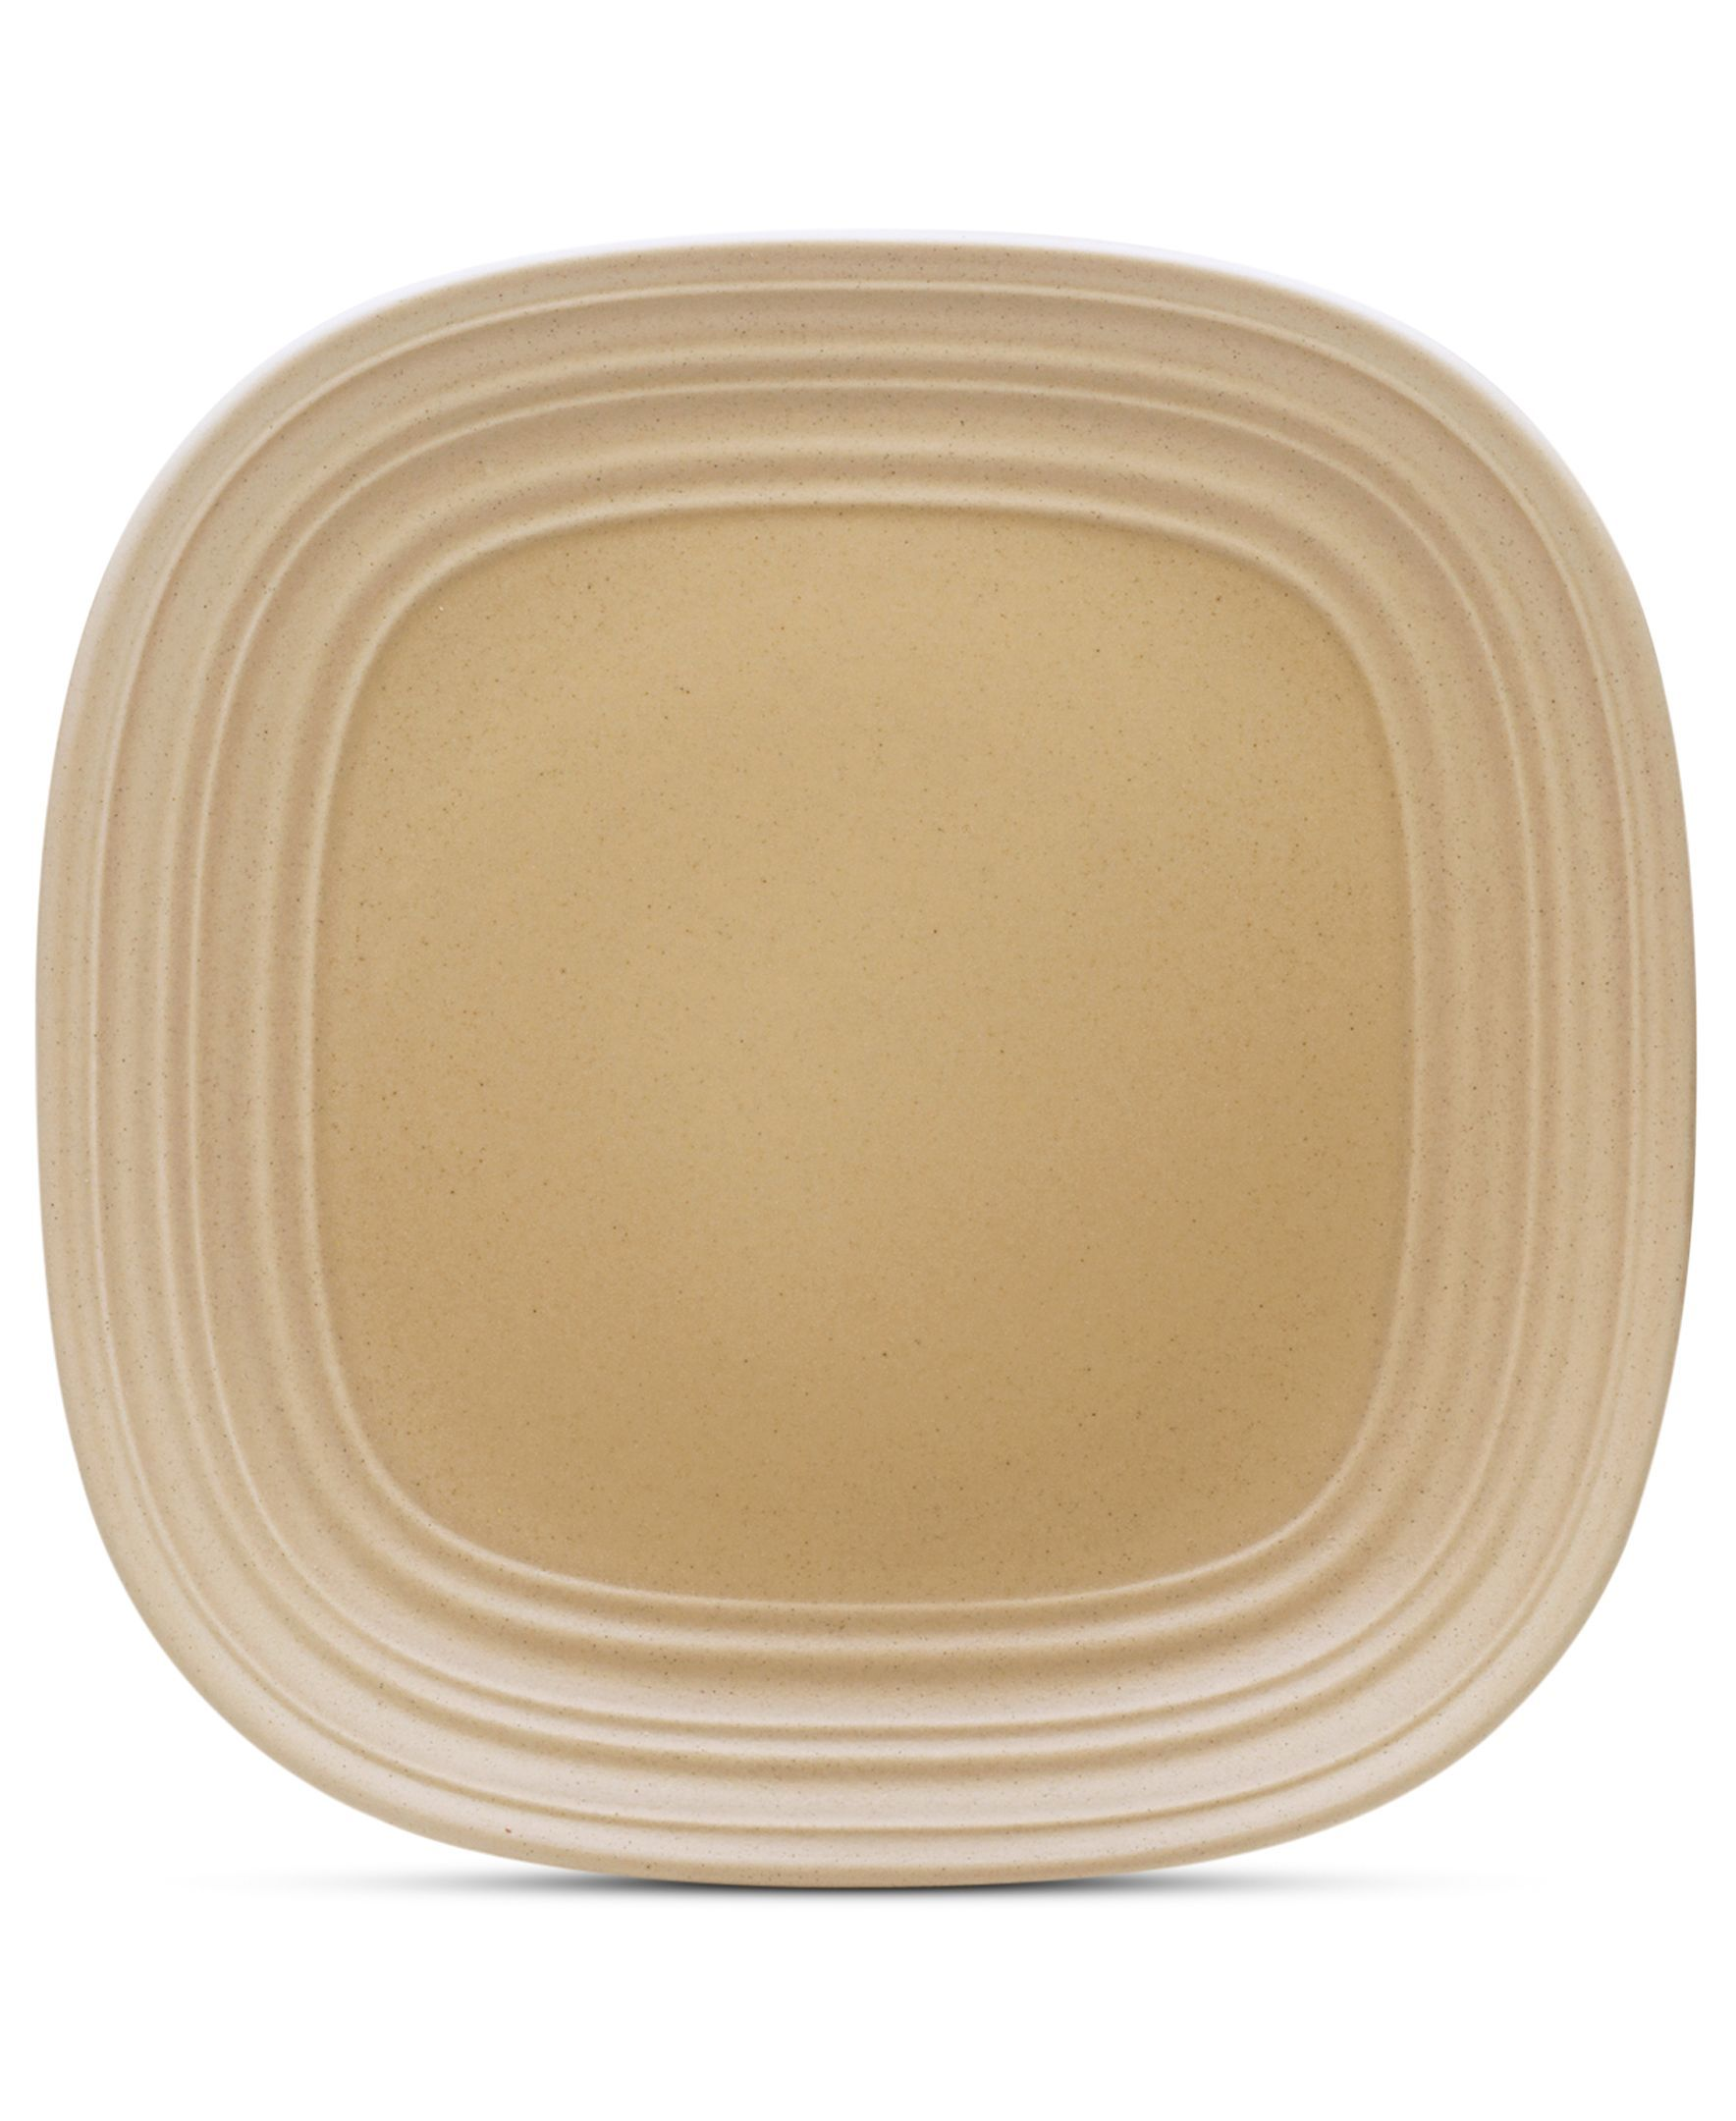 Mikasa Dinnerware, Swirl Square Tan Salad Plate | Products ...